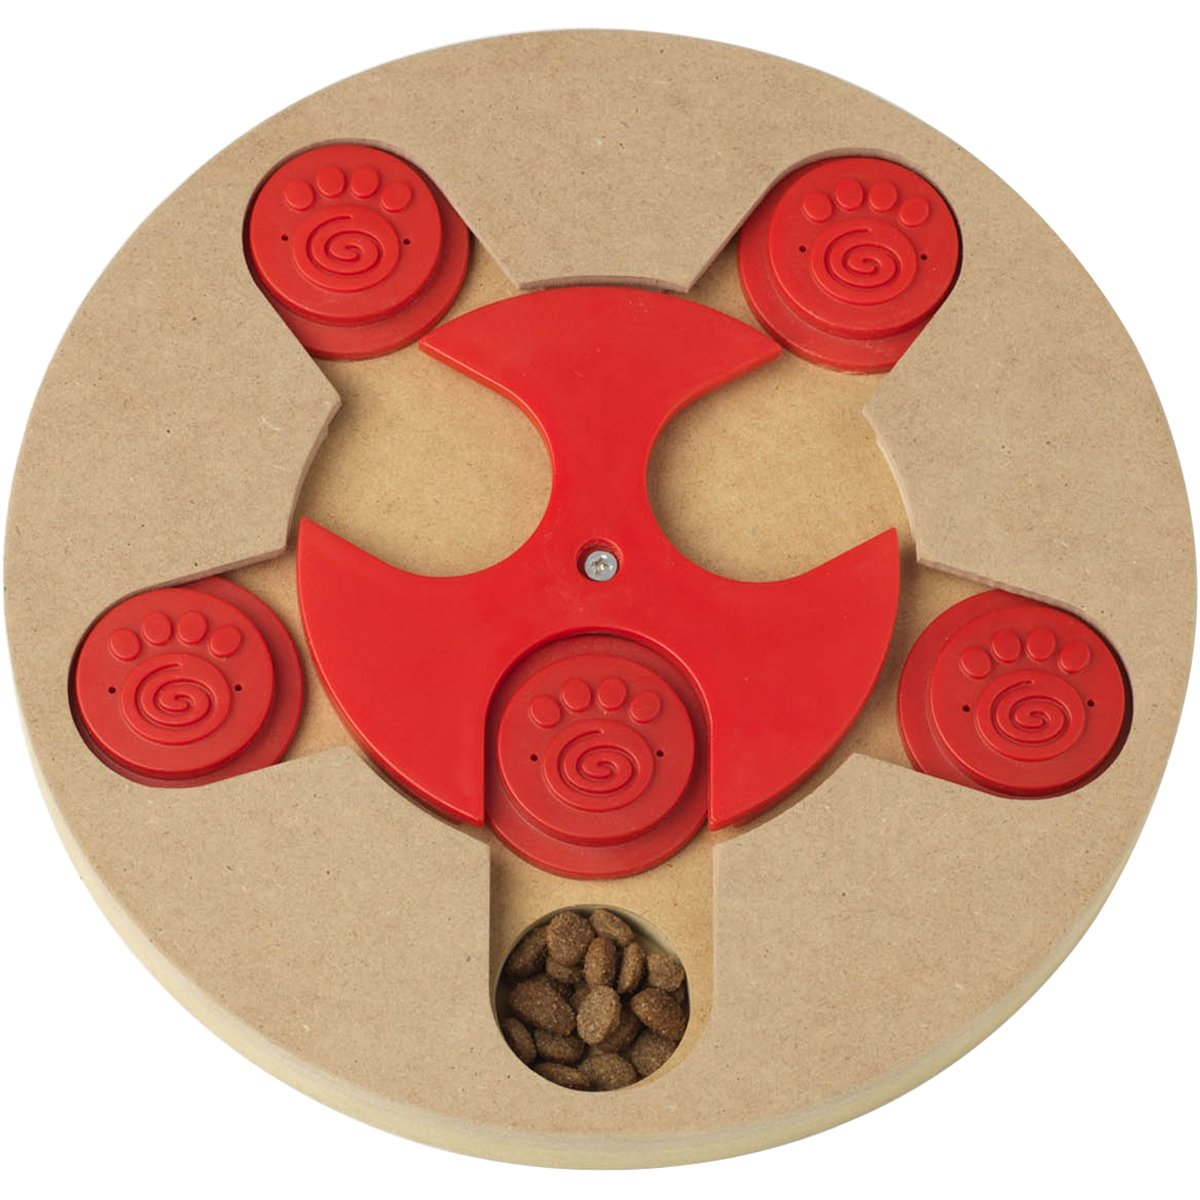 PetRageous Thinkrageous Interactive Advanced Level Puzzle Piece Pet Toy, 9.84'', Red